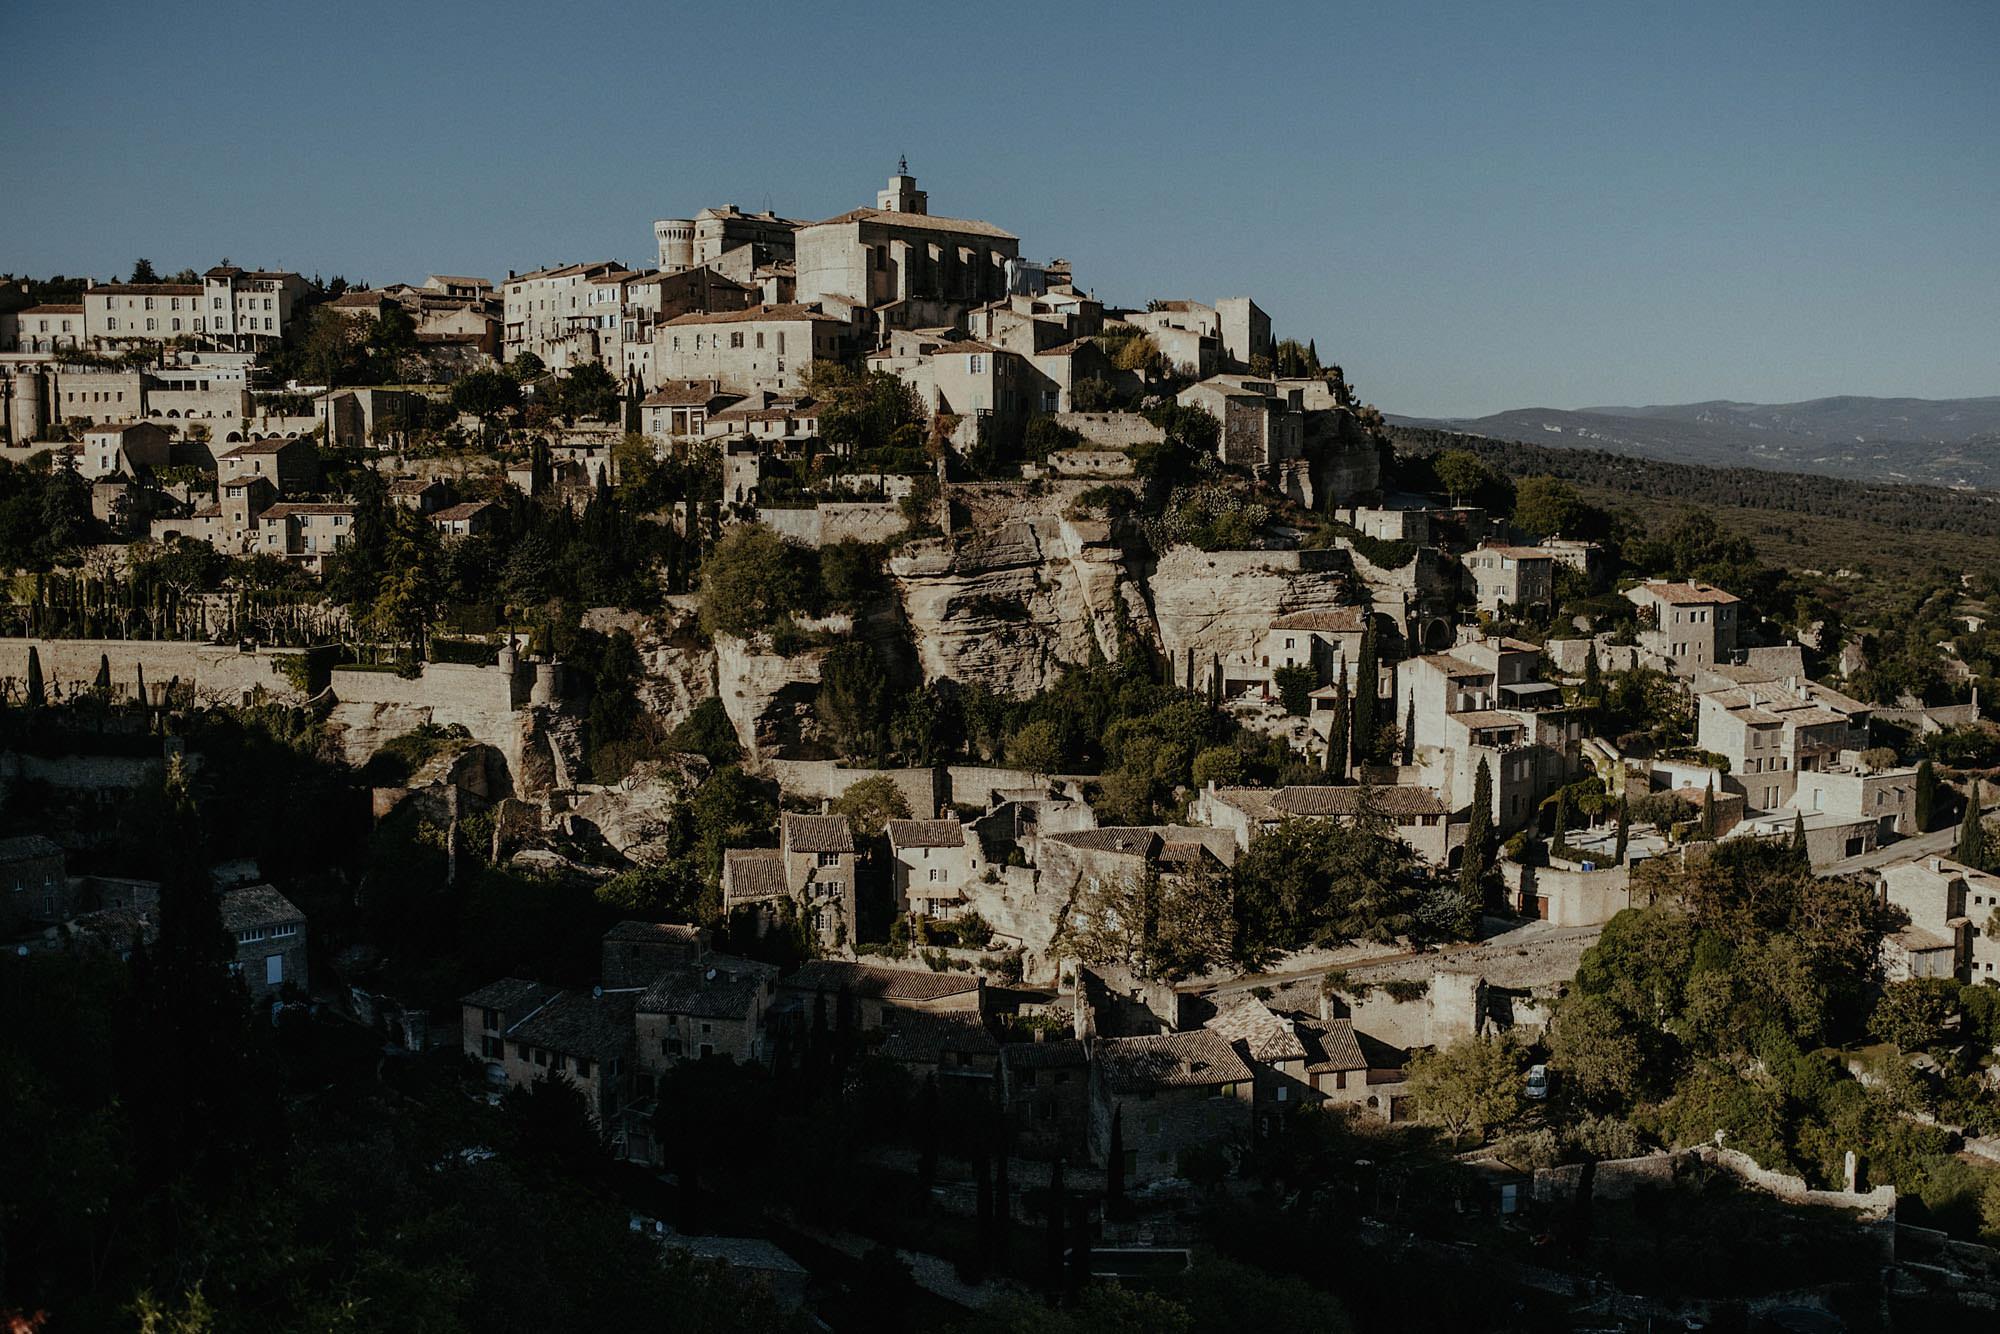 gorde provence france city photo